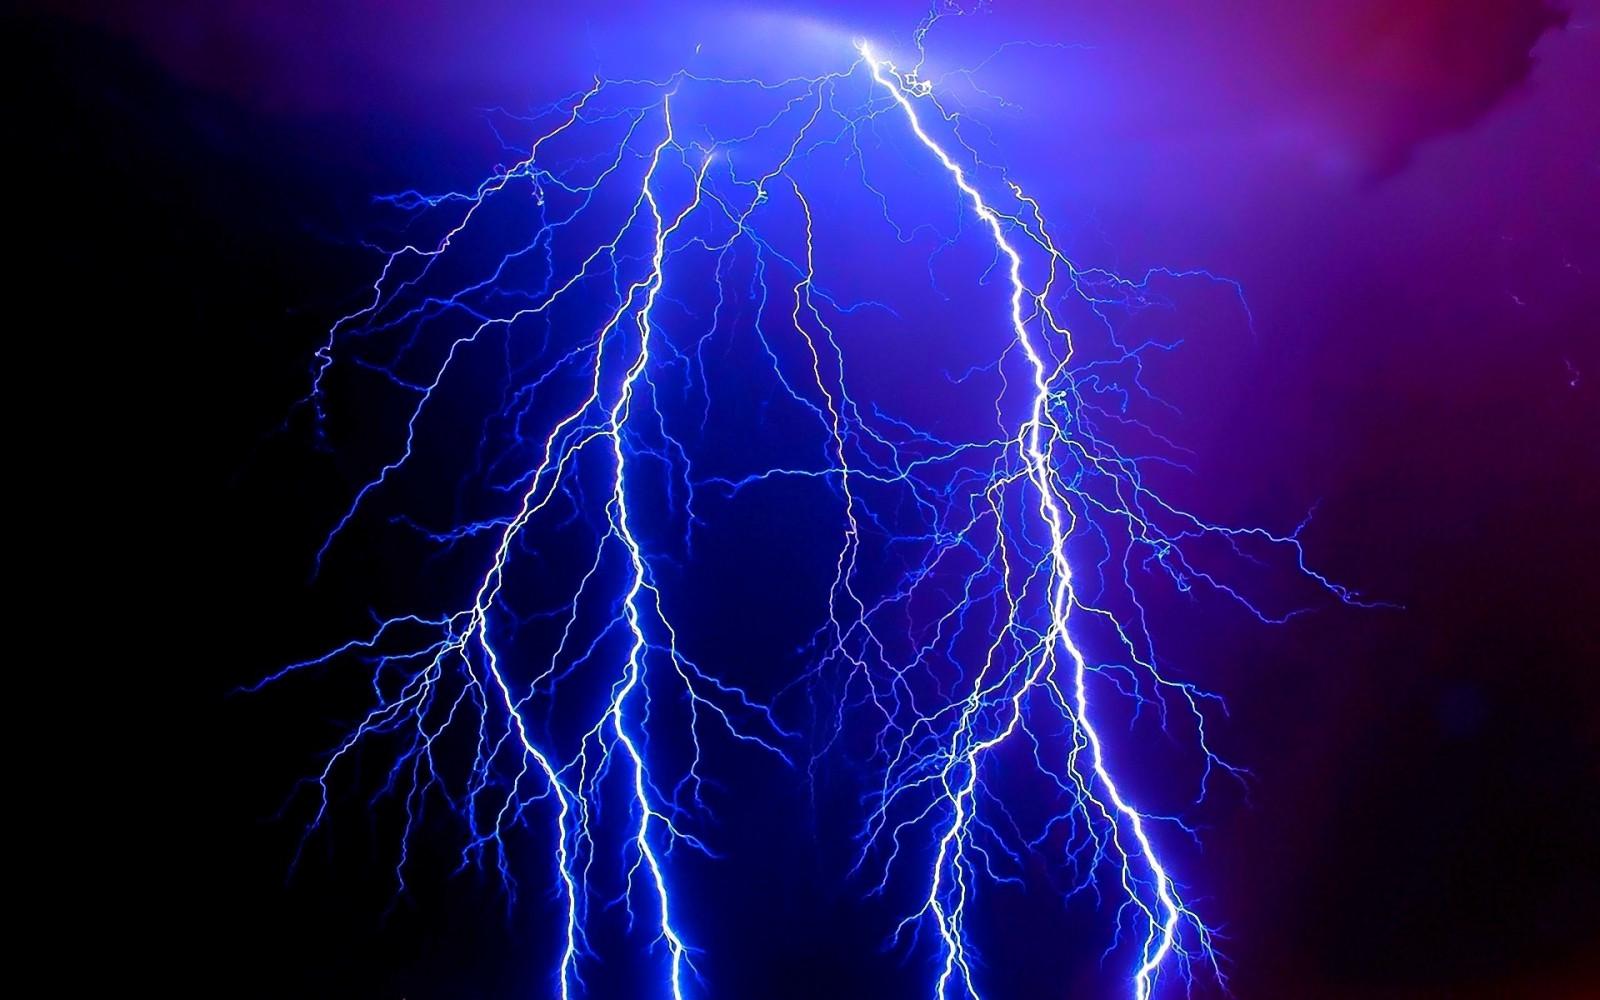 https://c.wallhere.com/photos/54/e6/lightning_electricity_category_elements_danger_night_lines_patterns-676803.jpg!d